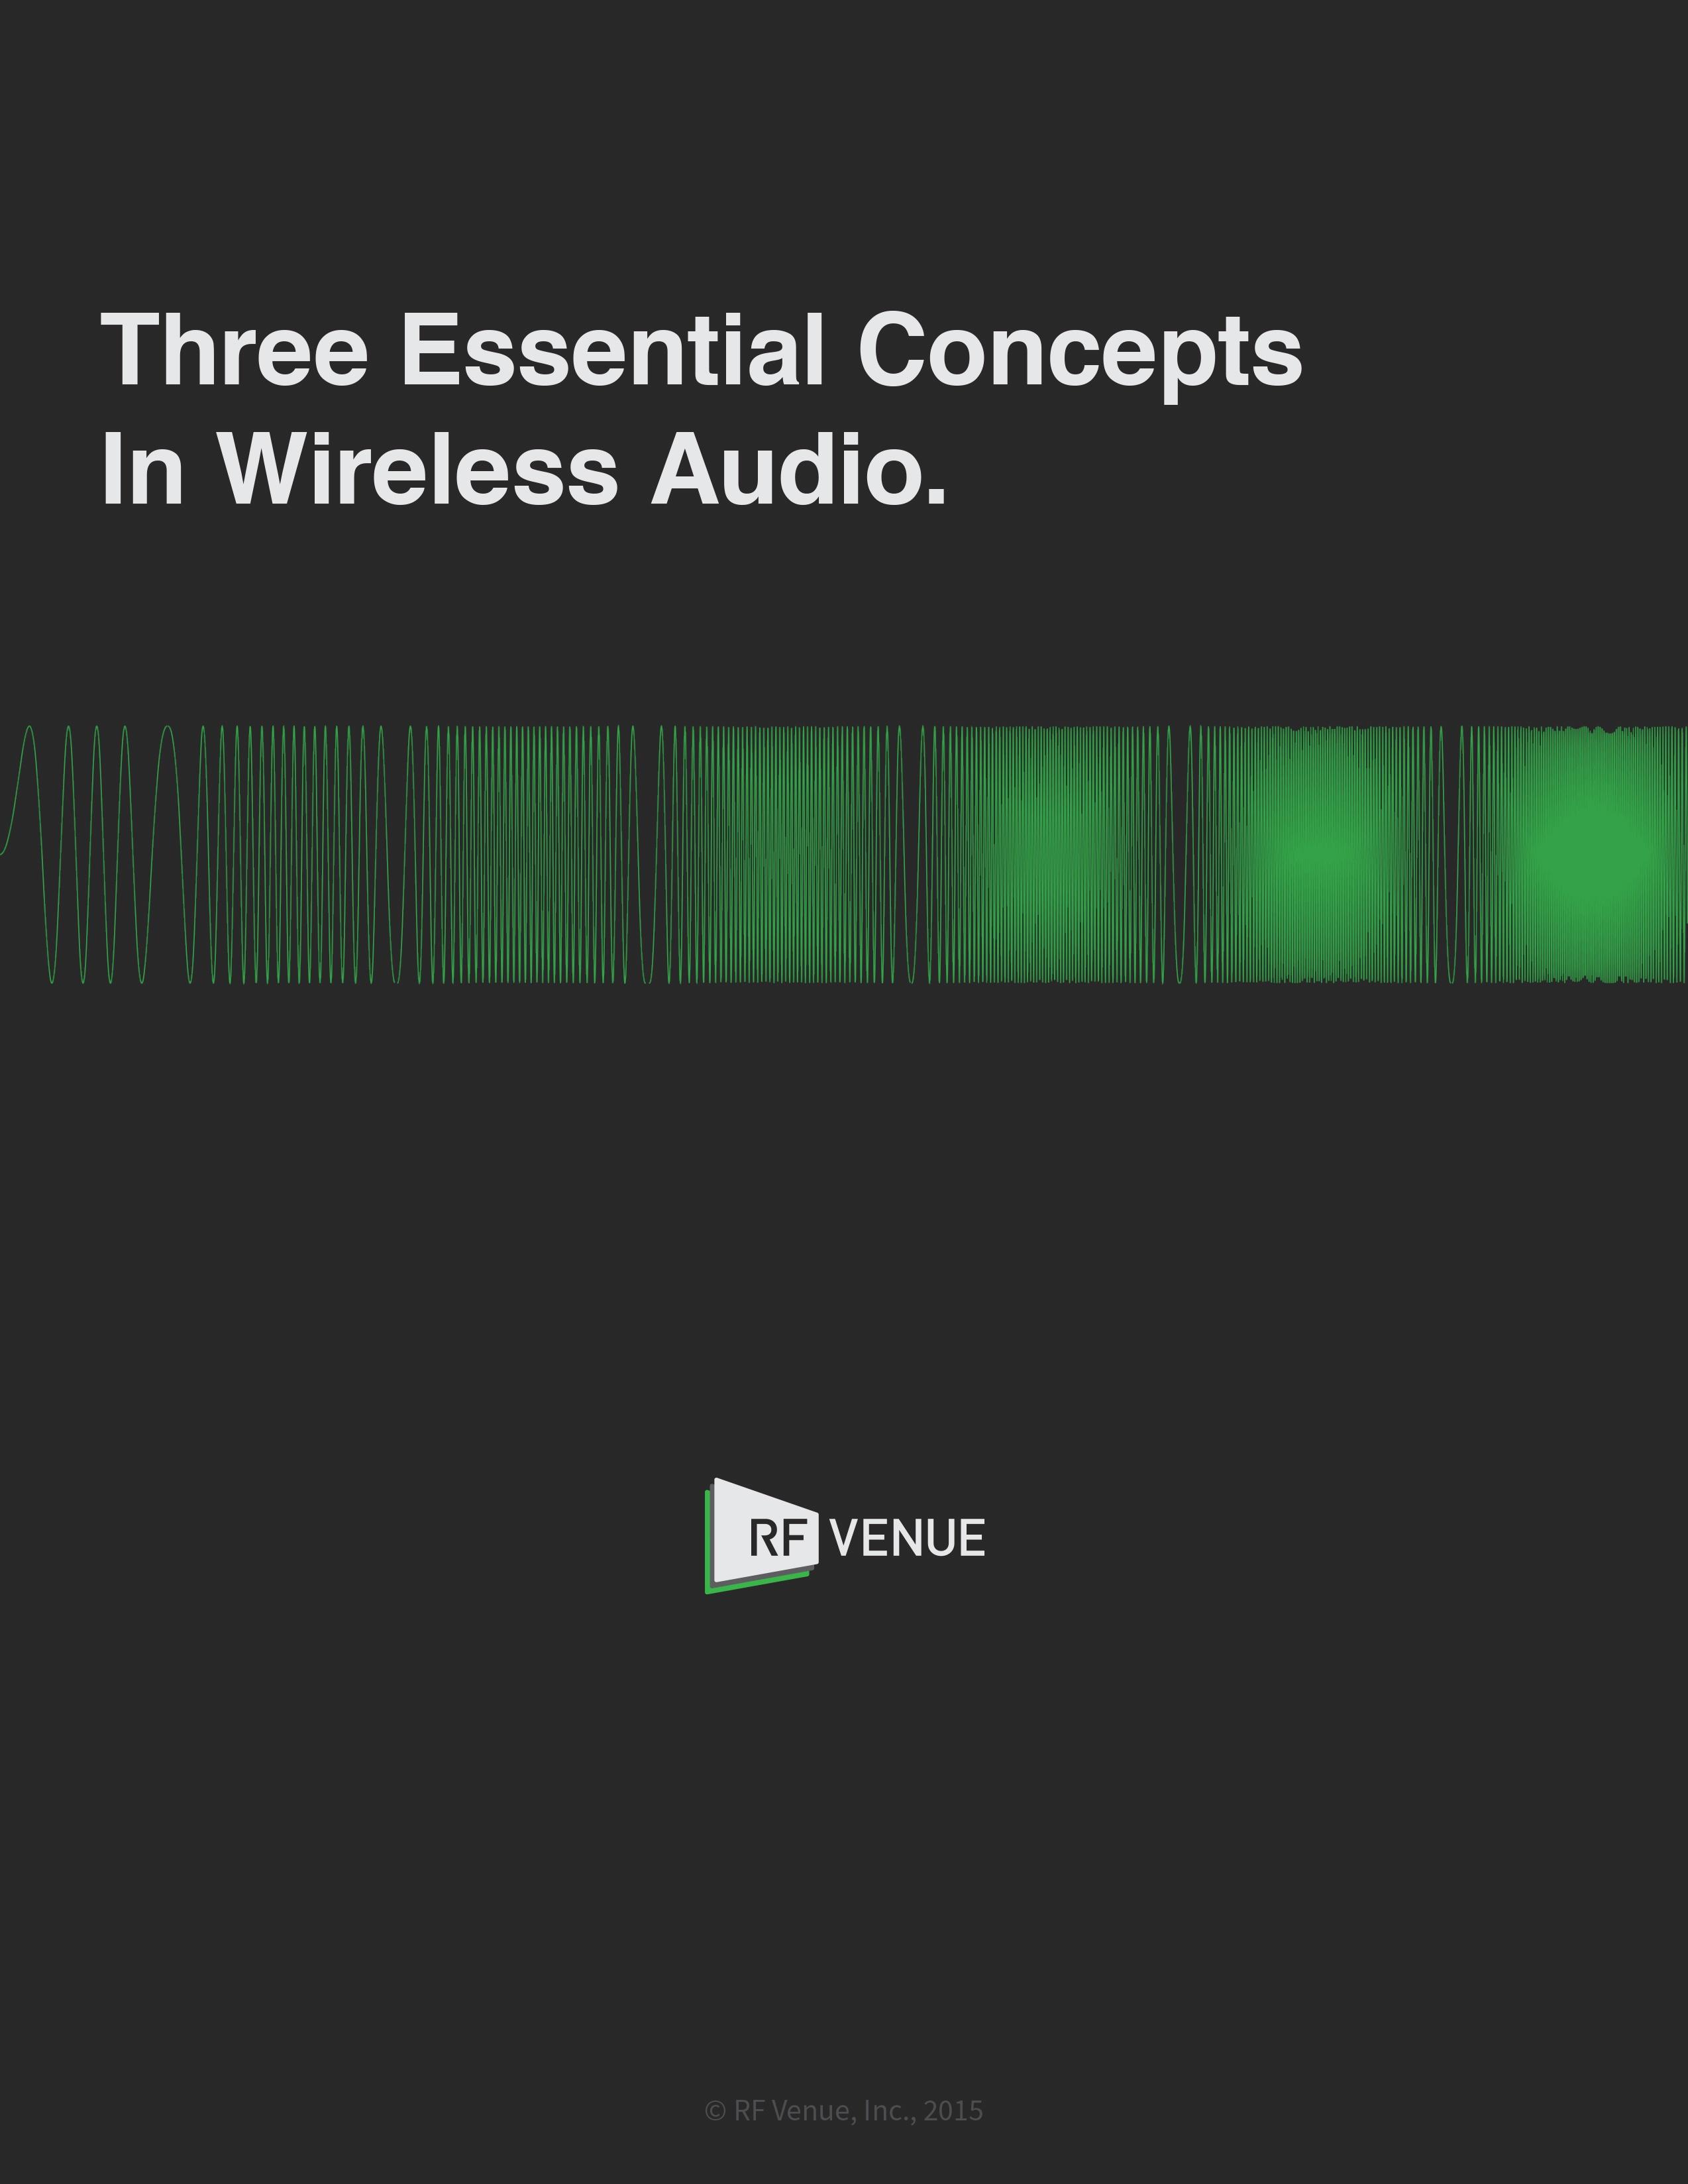 Three Essential Concepts in Wireless Audio-1.jpg